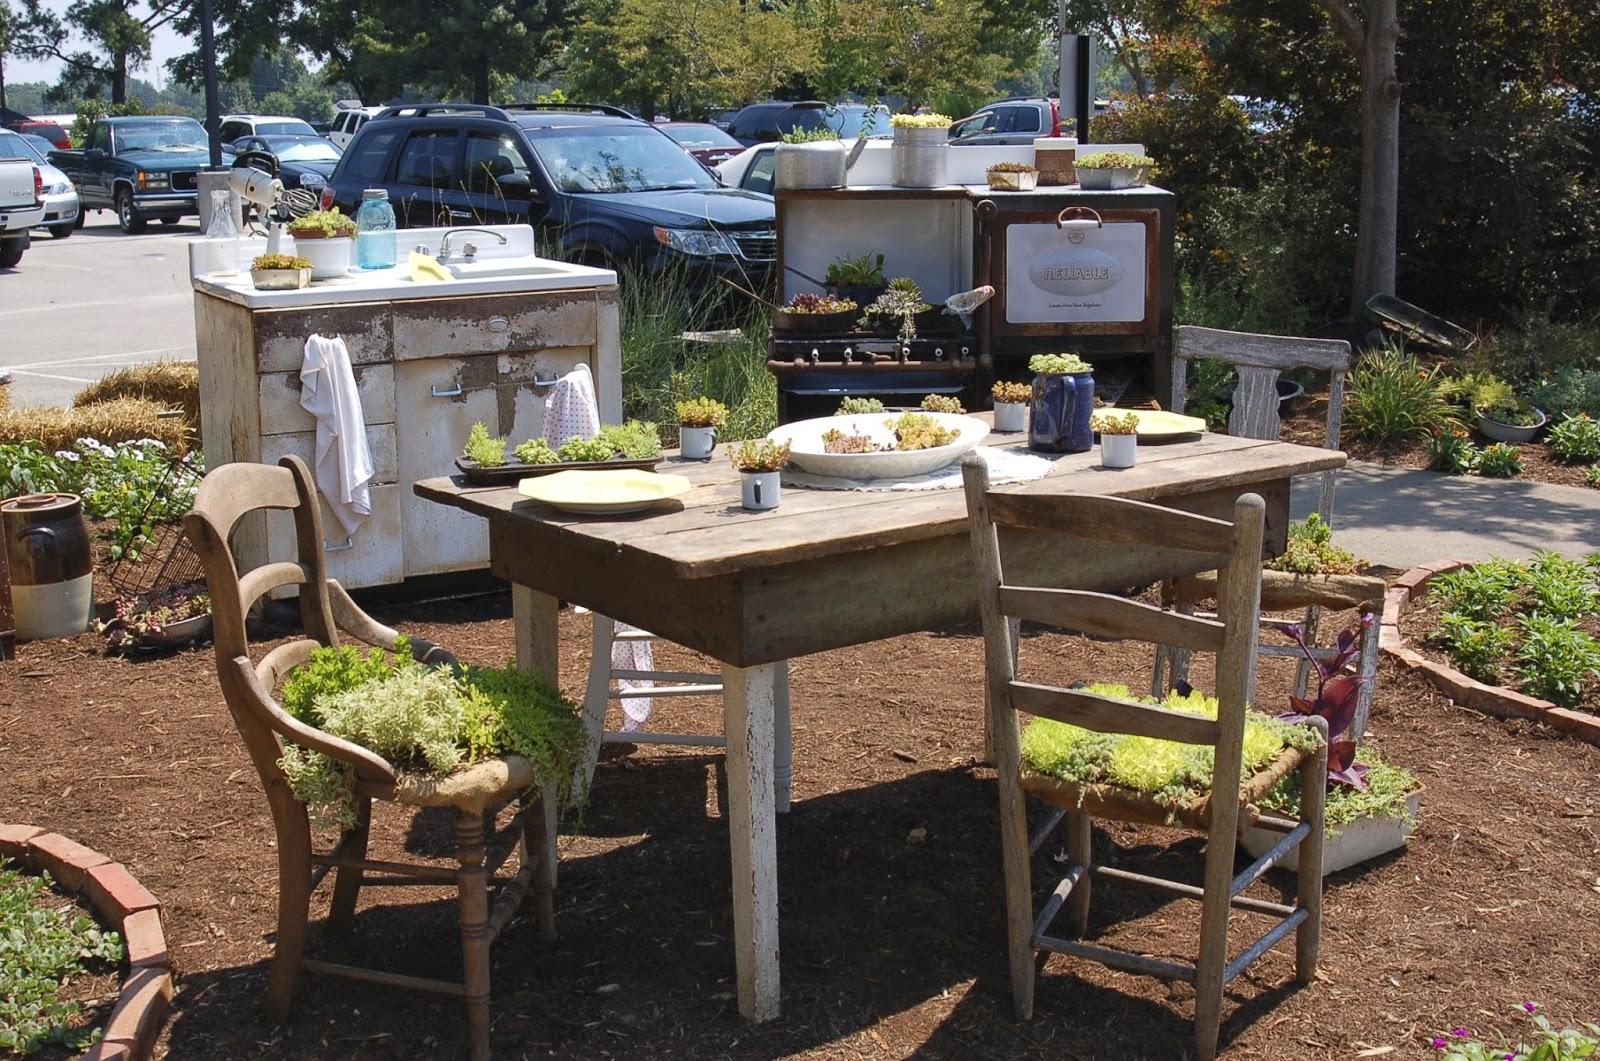 Labels: Jason Reeves, Sedum, Succulent Plants, Trial Gardens, University Of  Tennessee